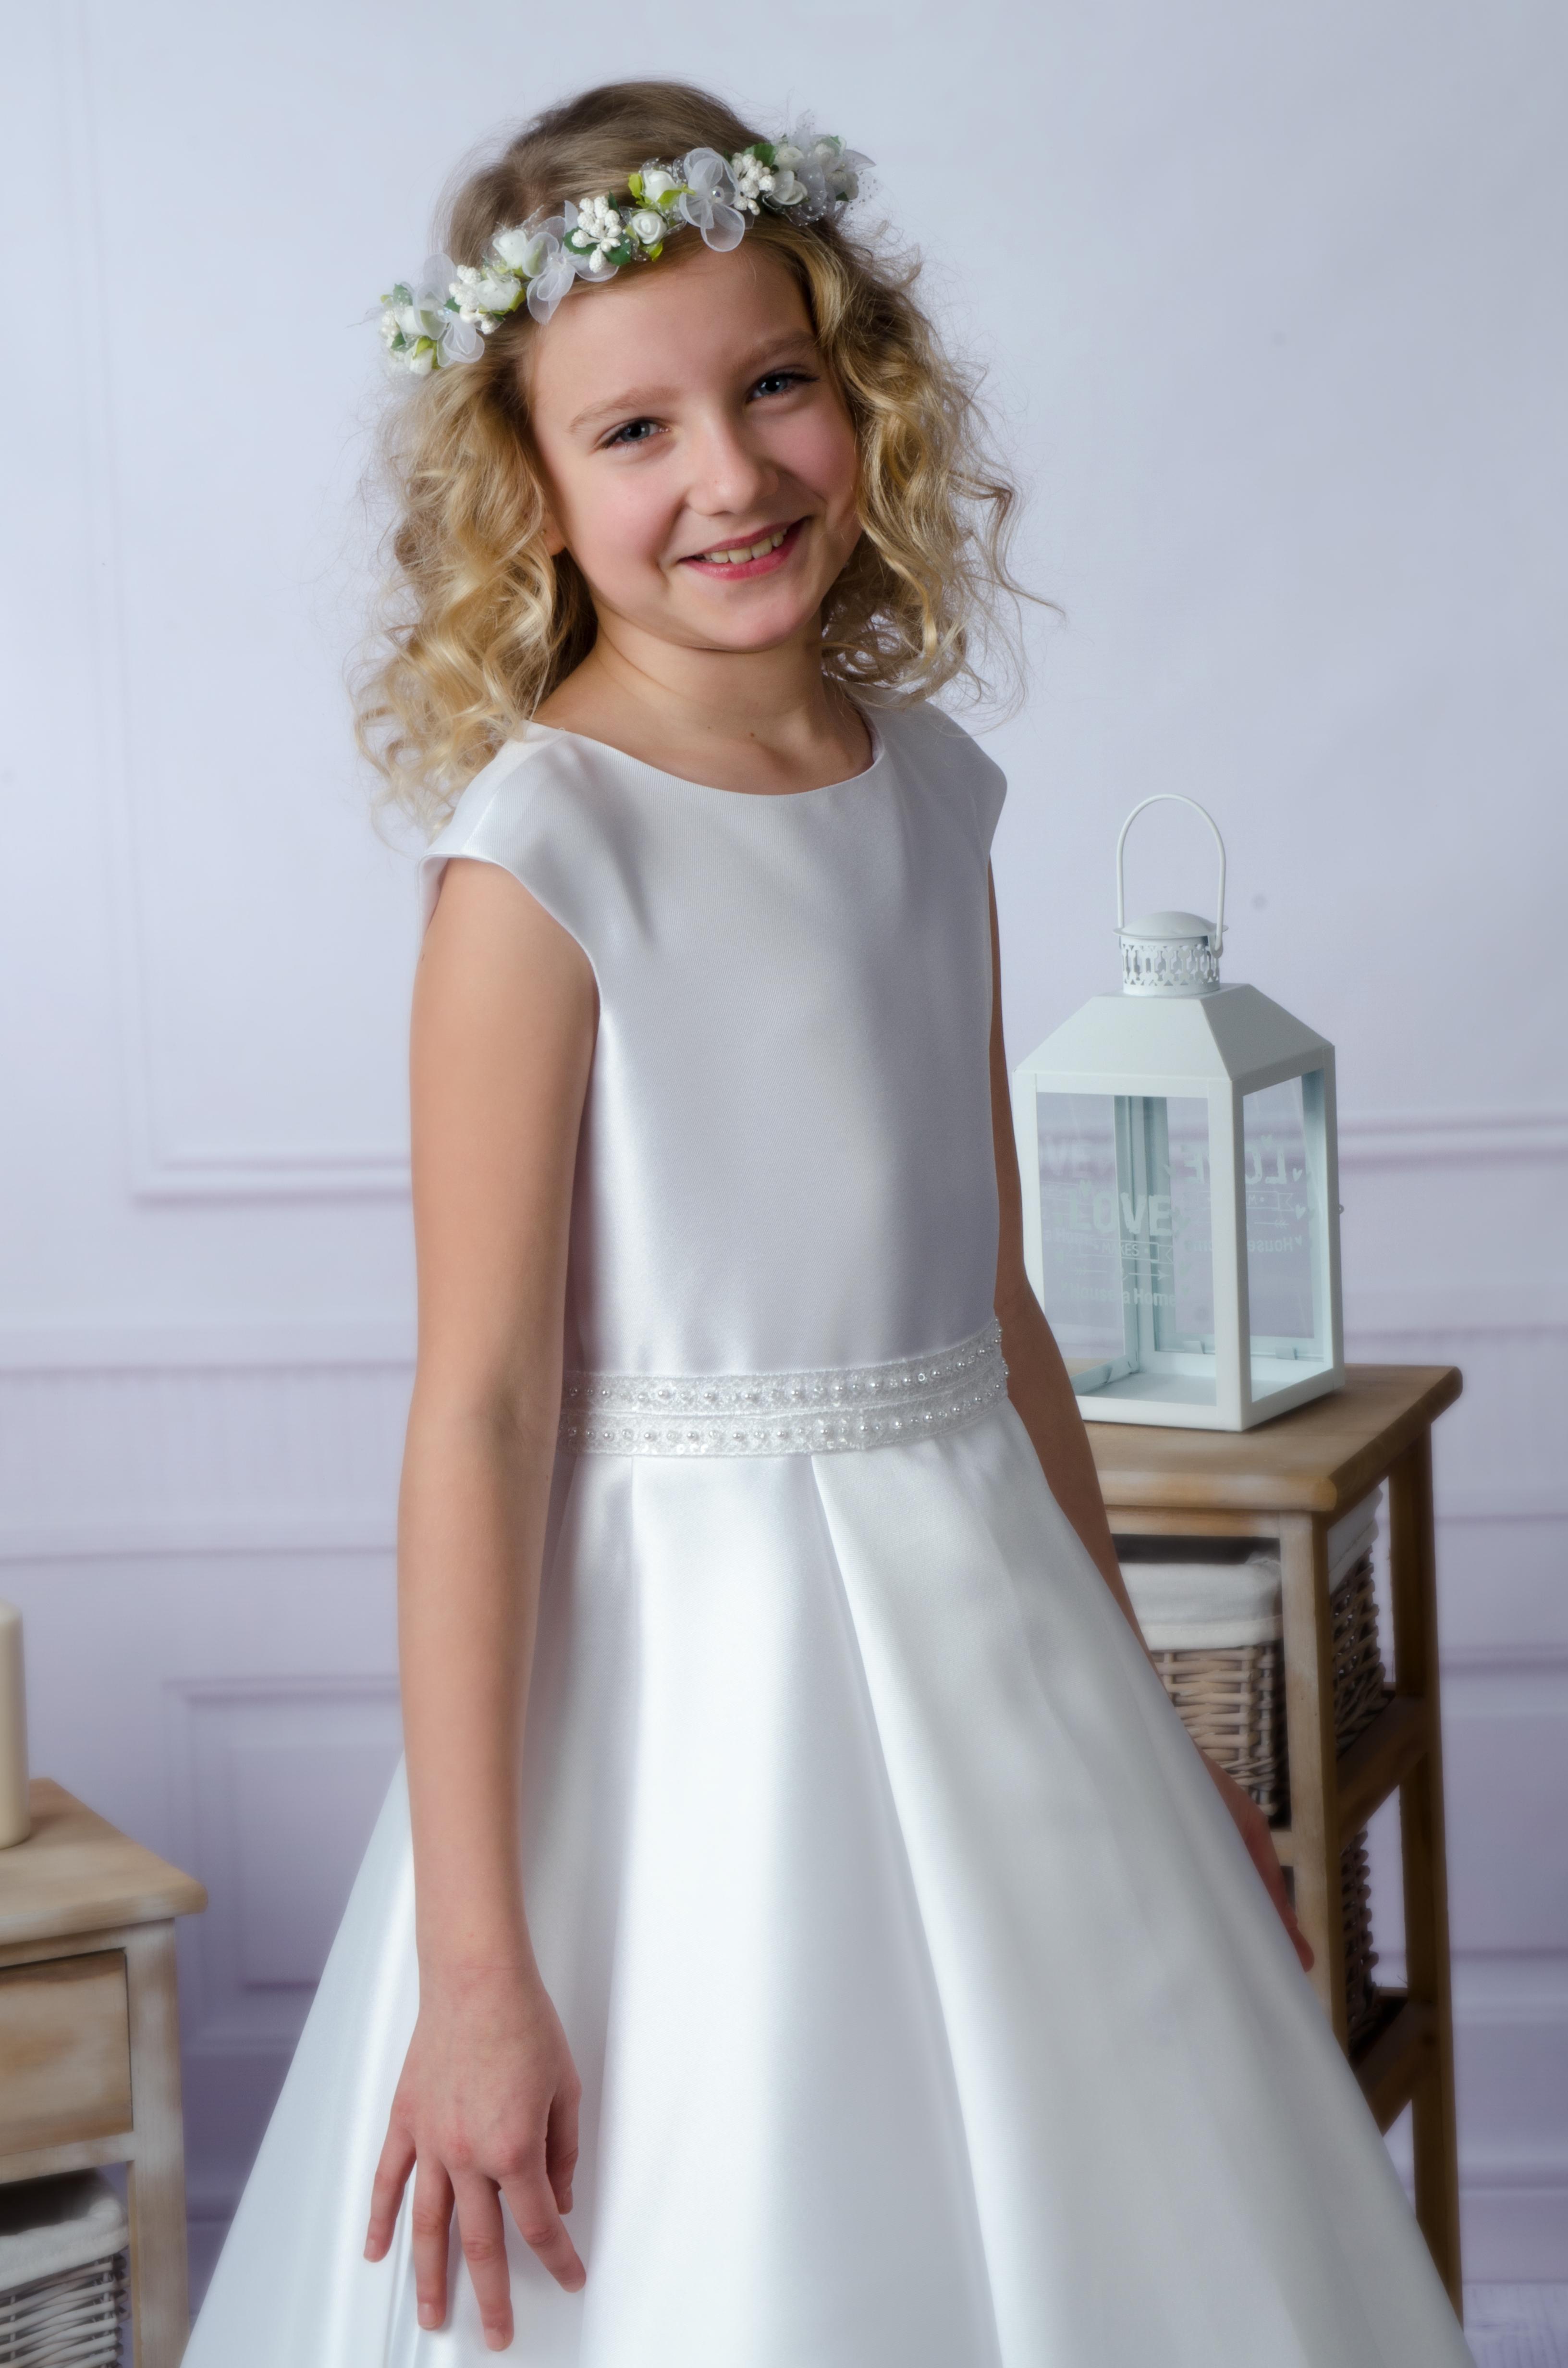 0e65dfef95 Sukienka komunijna Luiza to skromna i elegancka kreacja komunijna.